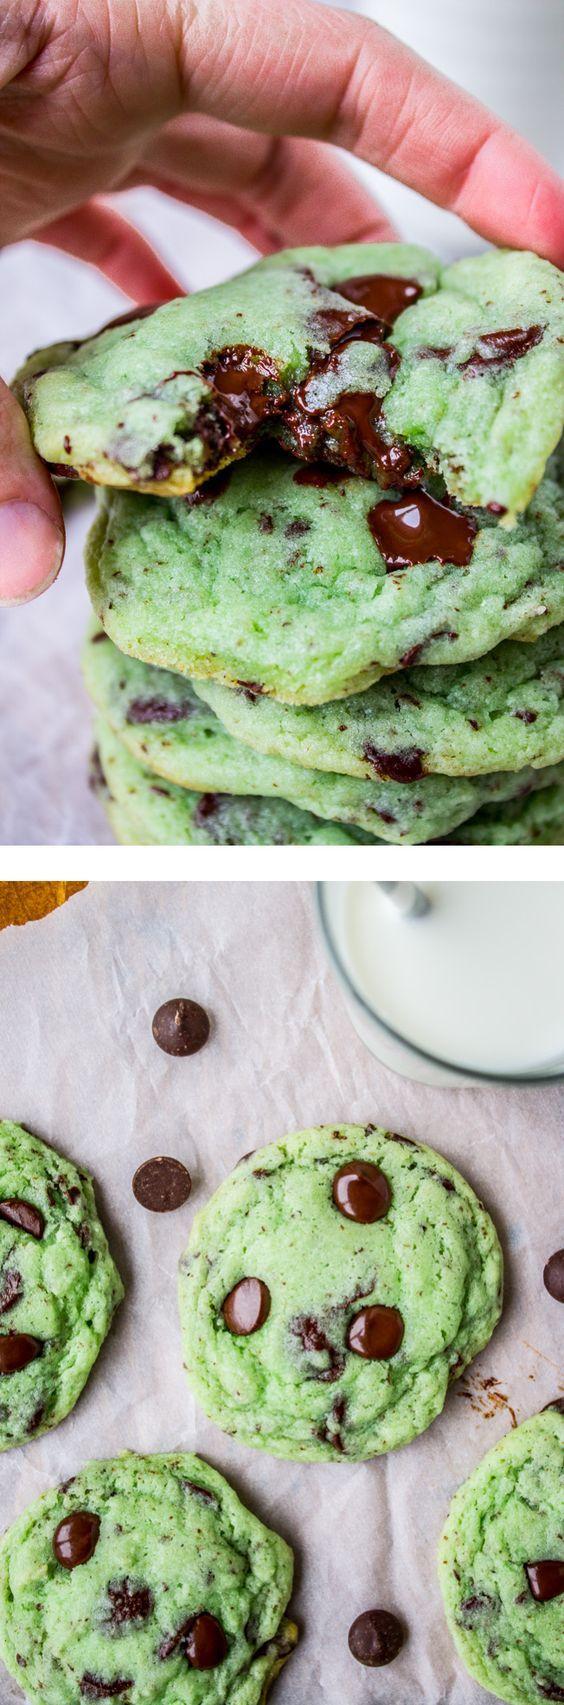 Mint Chocolate Chip Cookies // The Food Charlatan. Mint + dark chocolate…